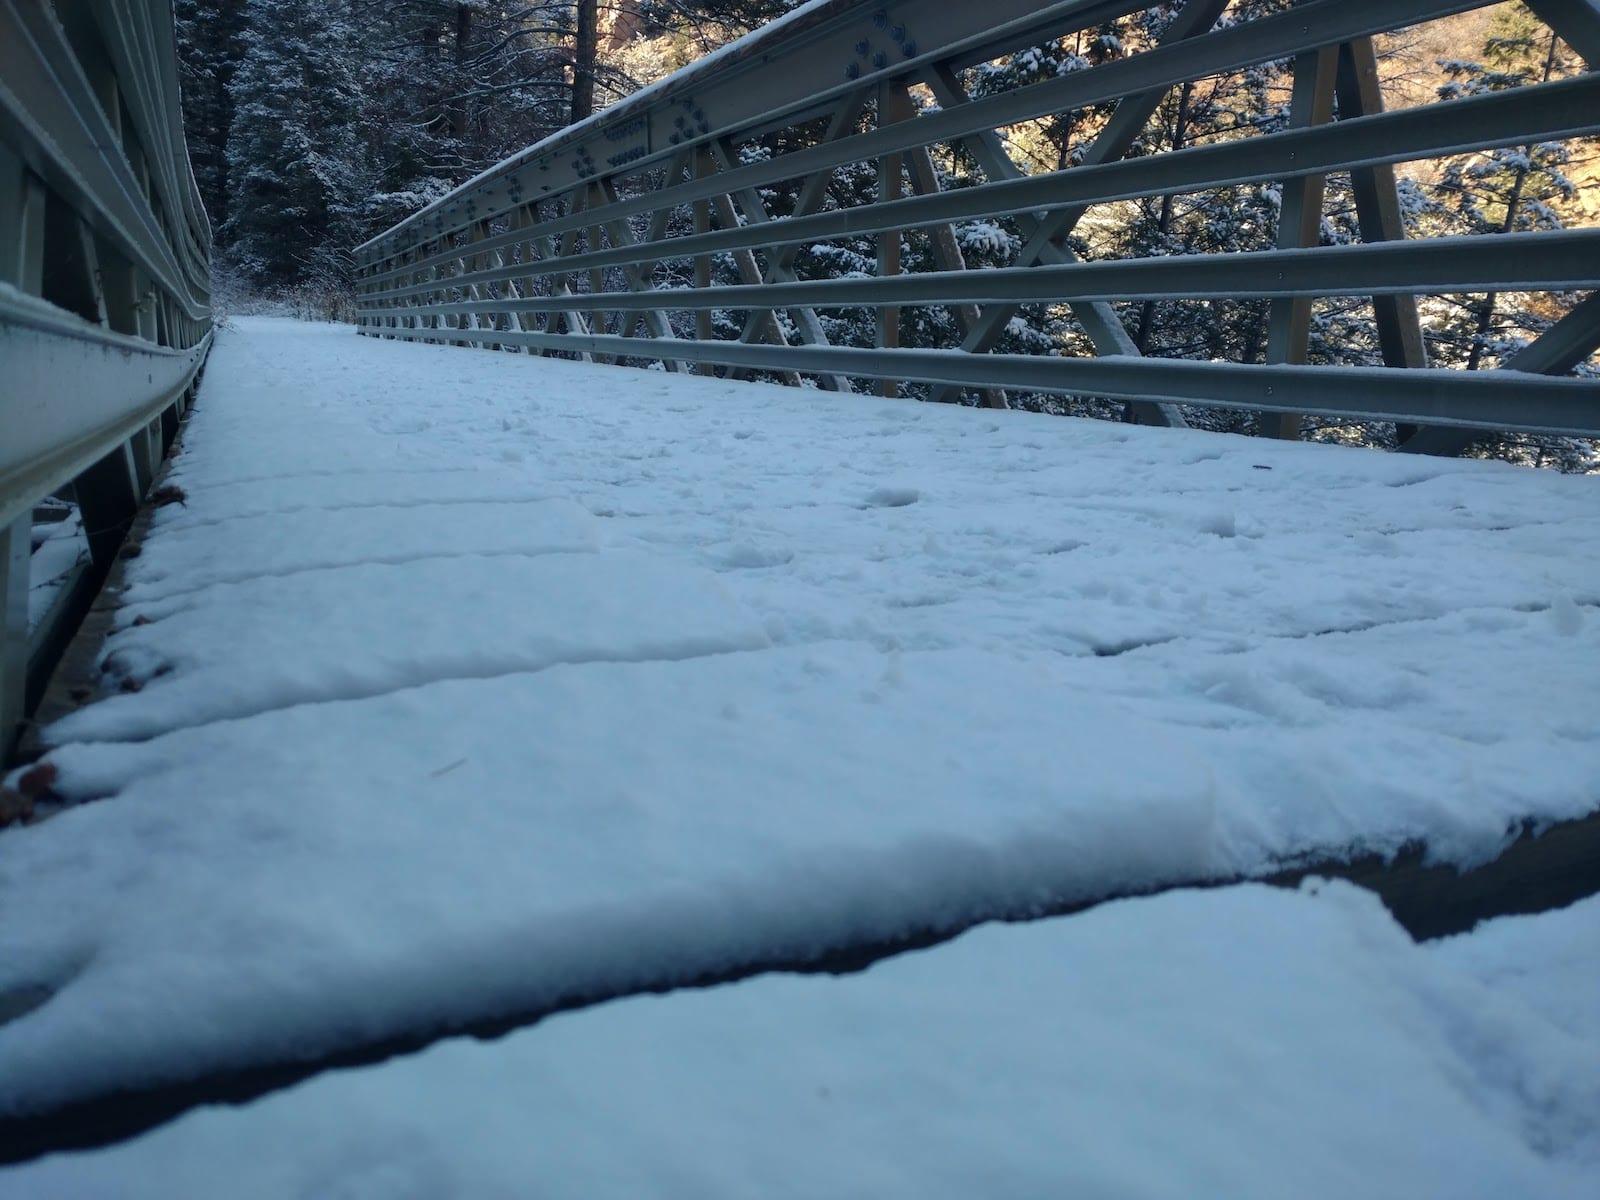 Cheyenne Canyon Winter Nature Walk over bridge